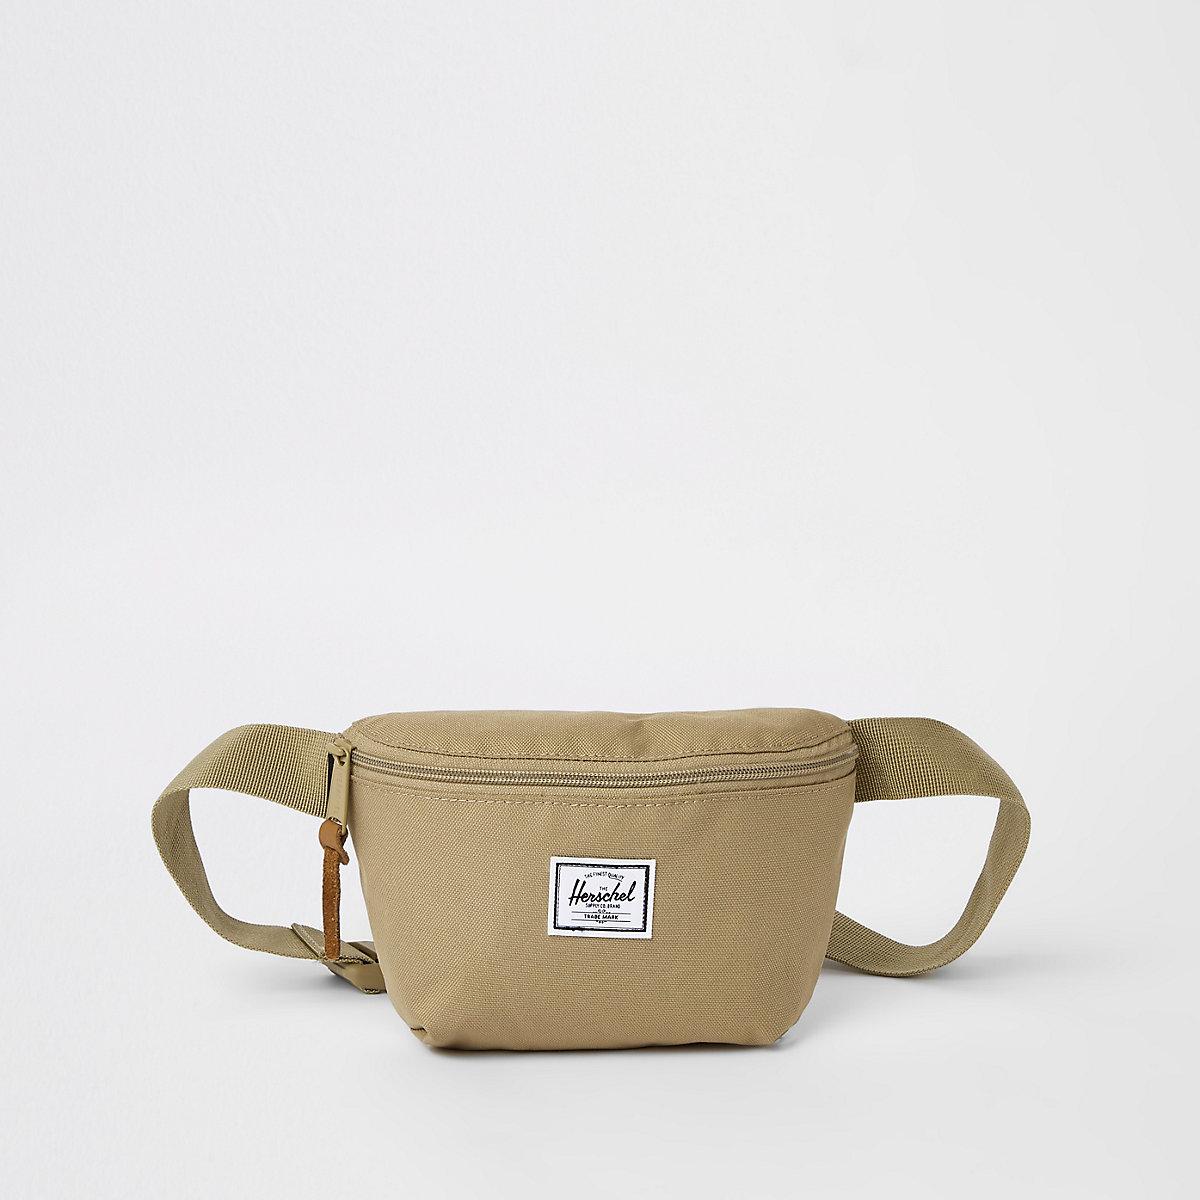 Herschel grey Fourteen cross body bag